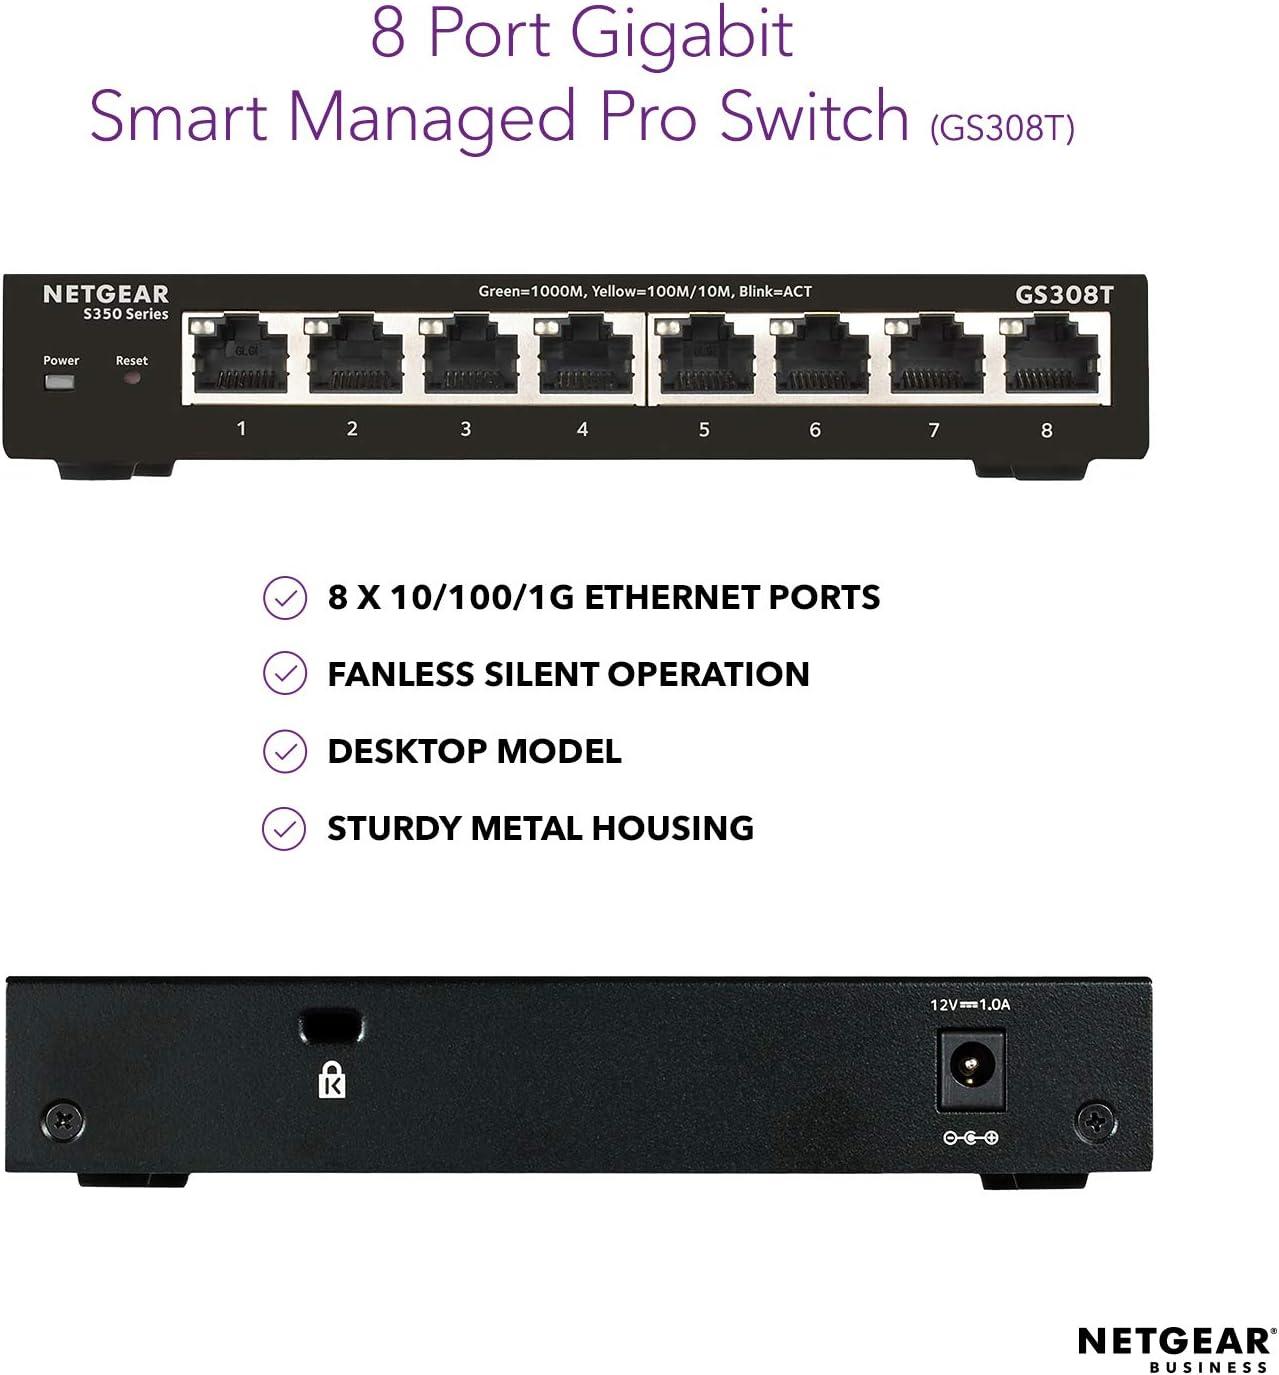 GS348T S350 Series Desktop//Rackmount NETGEAR 52-Port Gigabit Ethernet Smart Managed Pro Switch - with 4 x 1G SFP